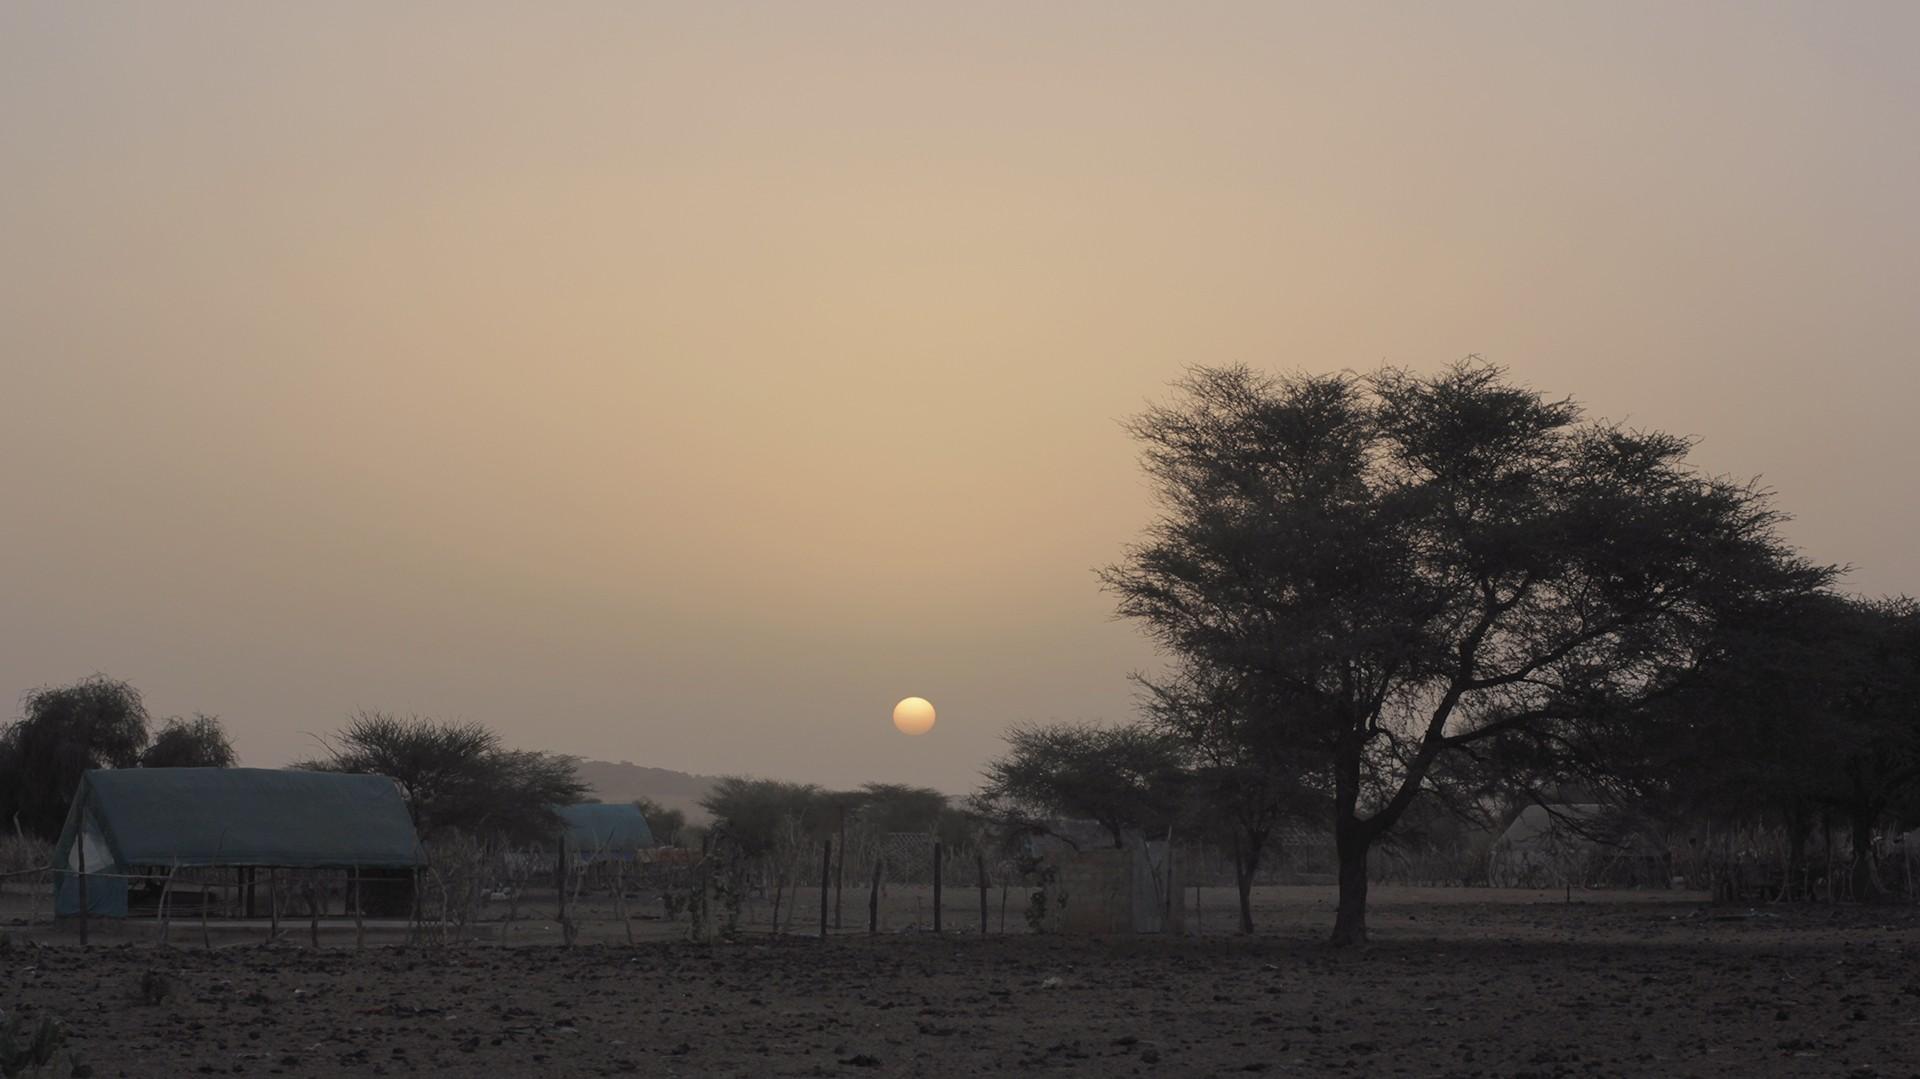 atardece mauritania pablocaminante - Mauritania 4/5, Nouakchott a Gogui